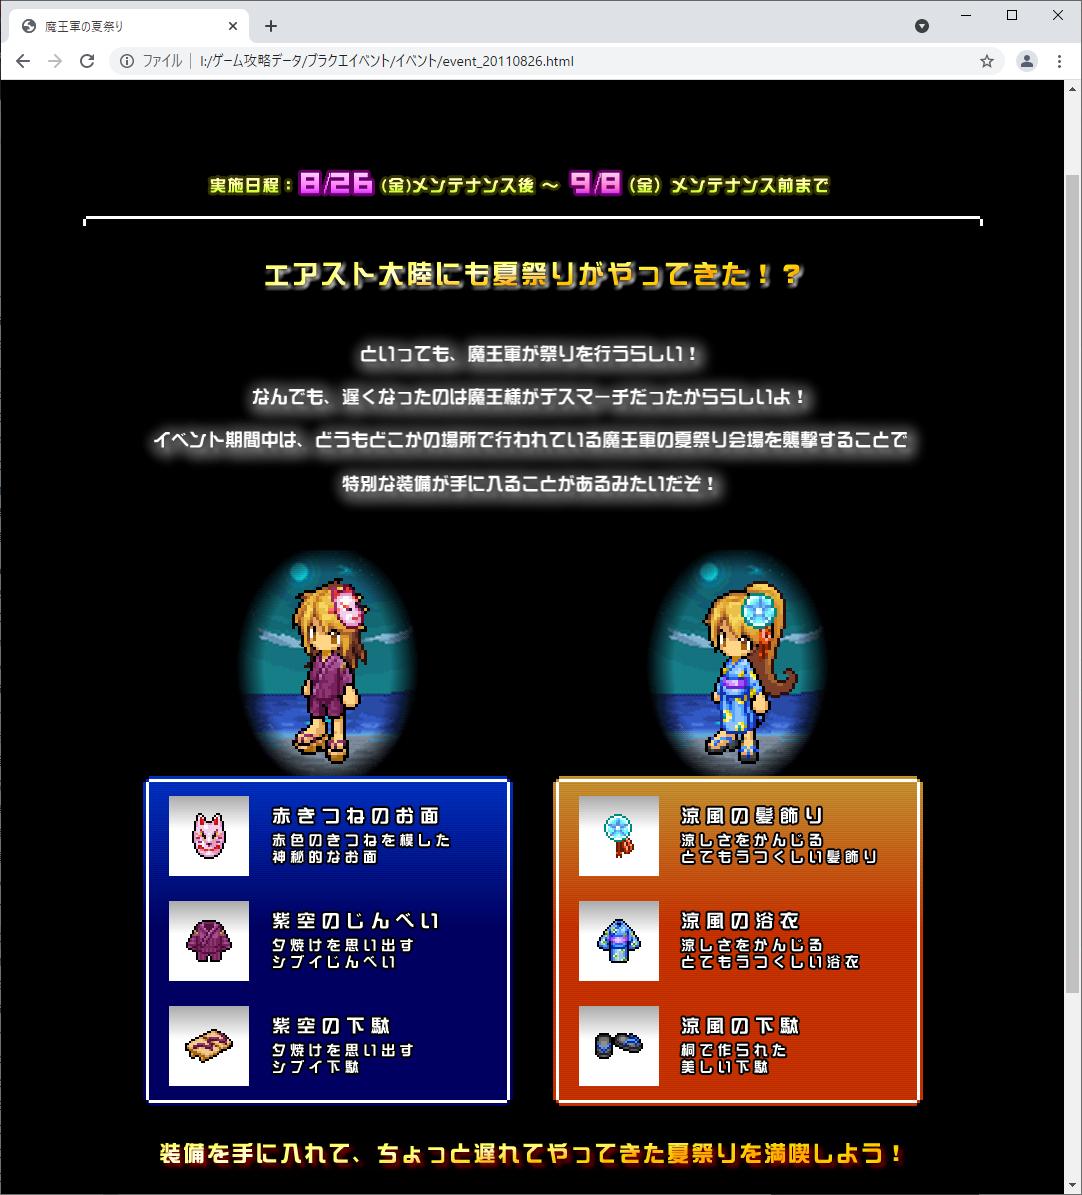 f:id:setoalpha:20210509153328p:plain